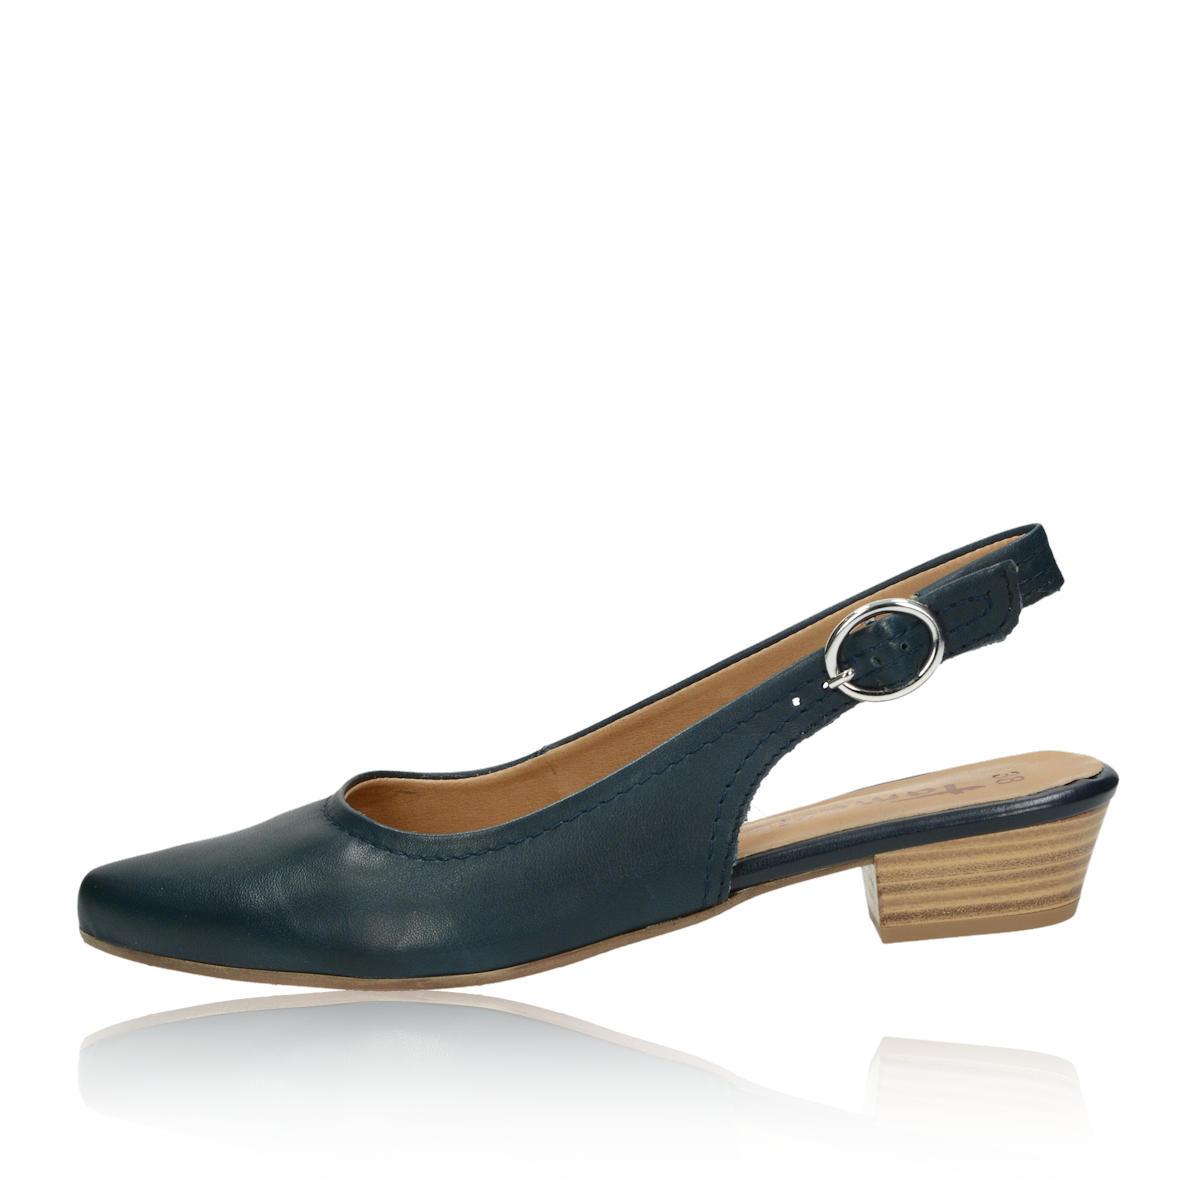 35ebeecdf5 Tamaris dámske kožené sandále - modré ...